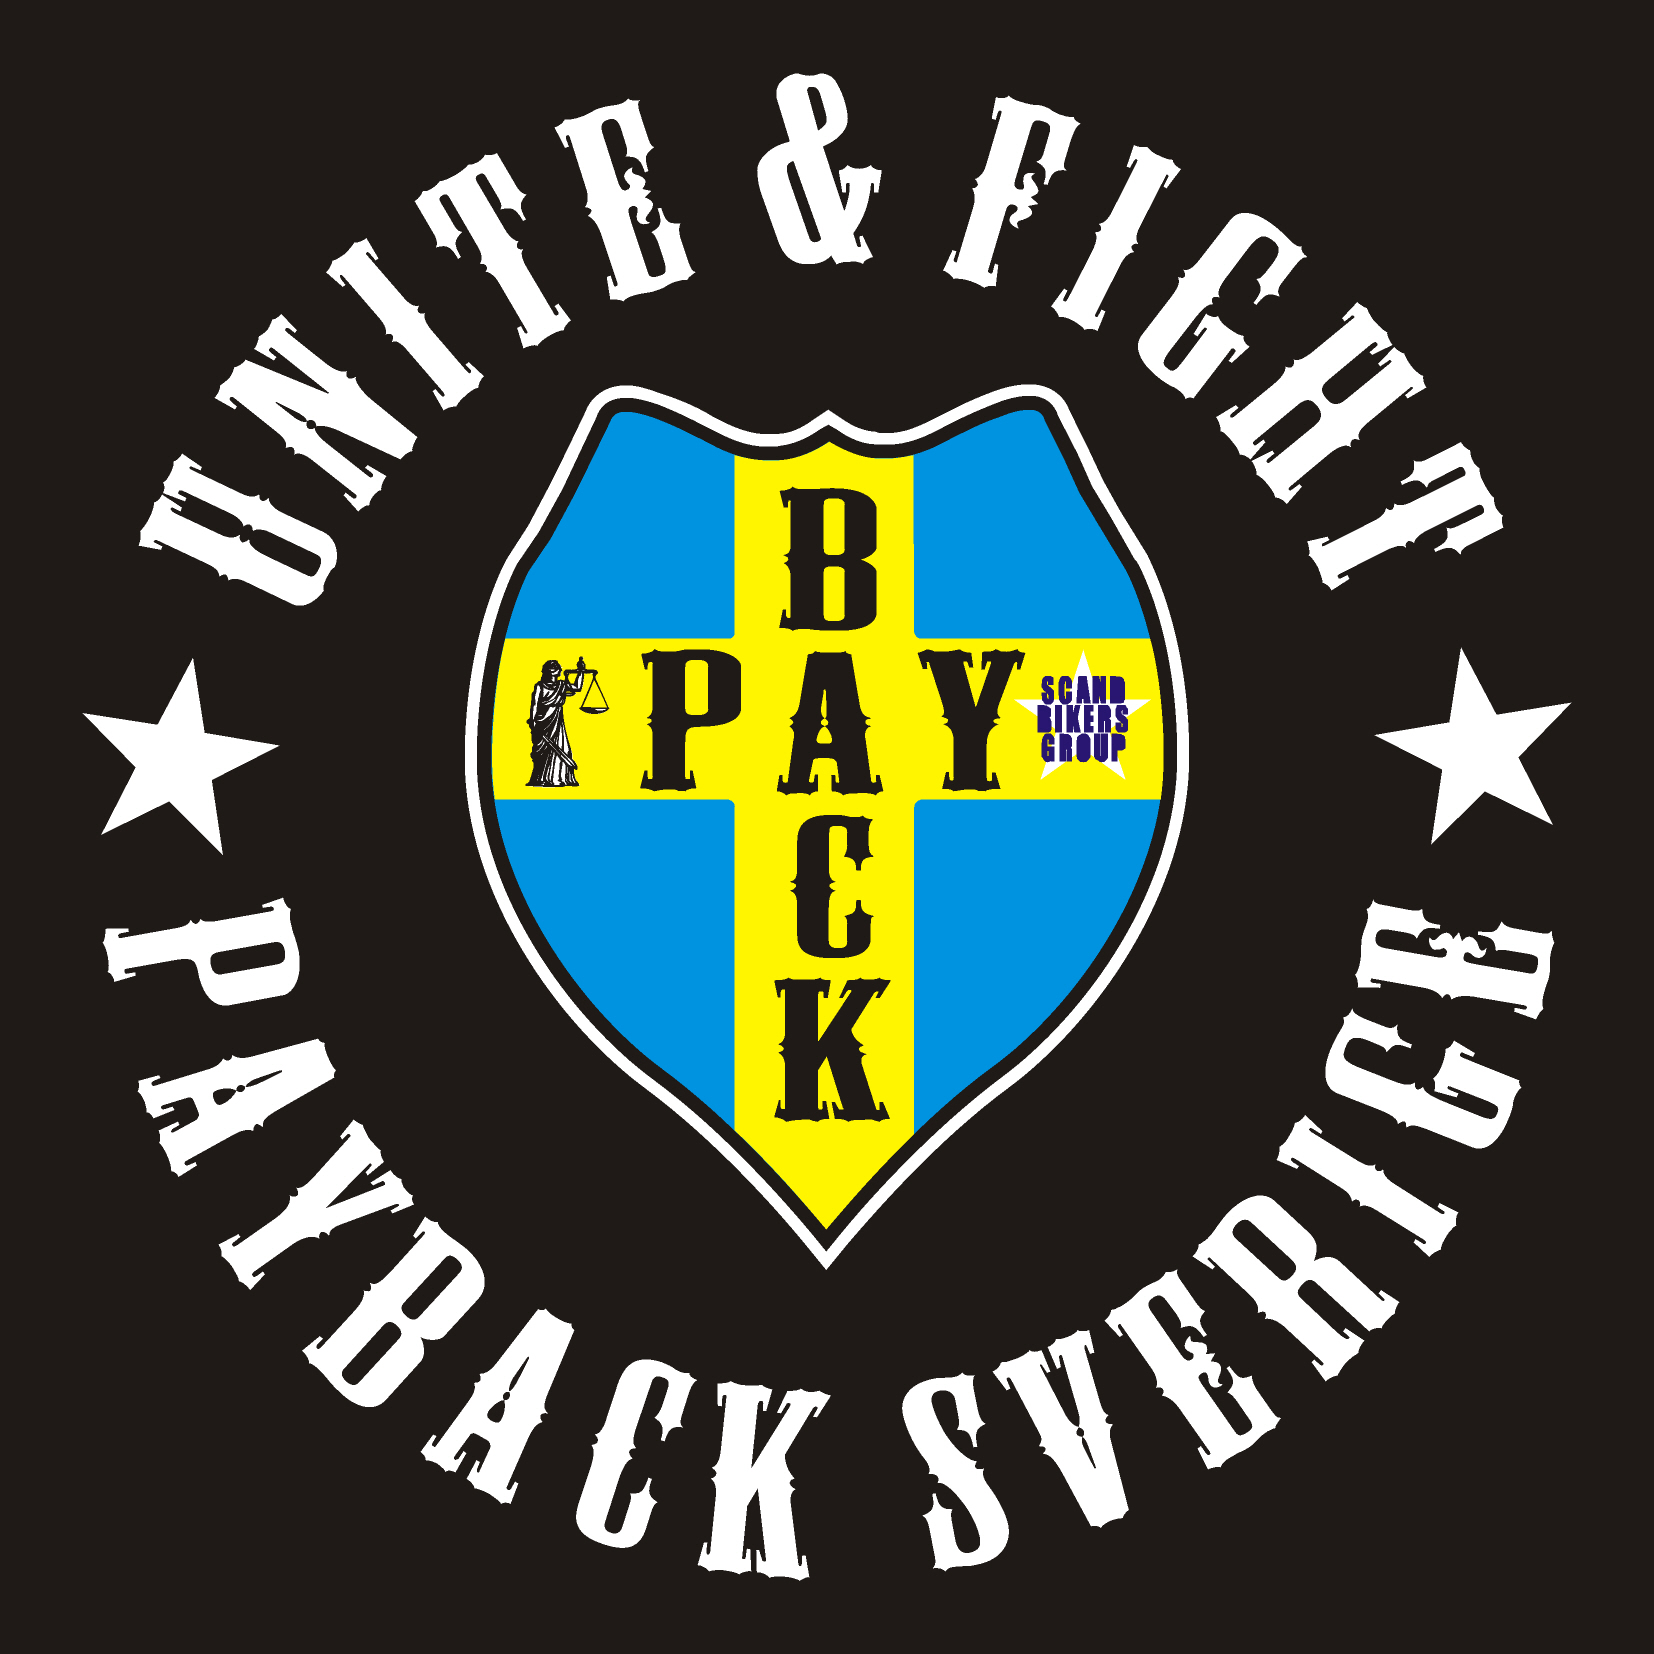 Unite&Fight